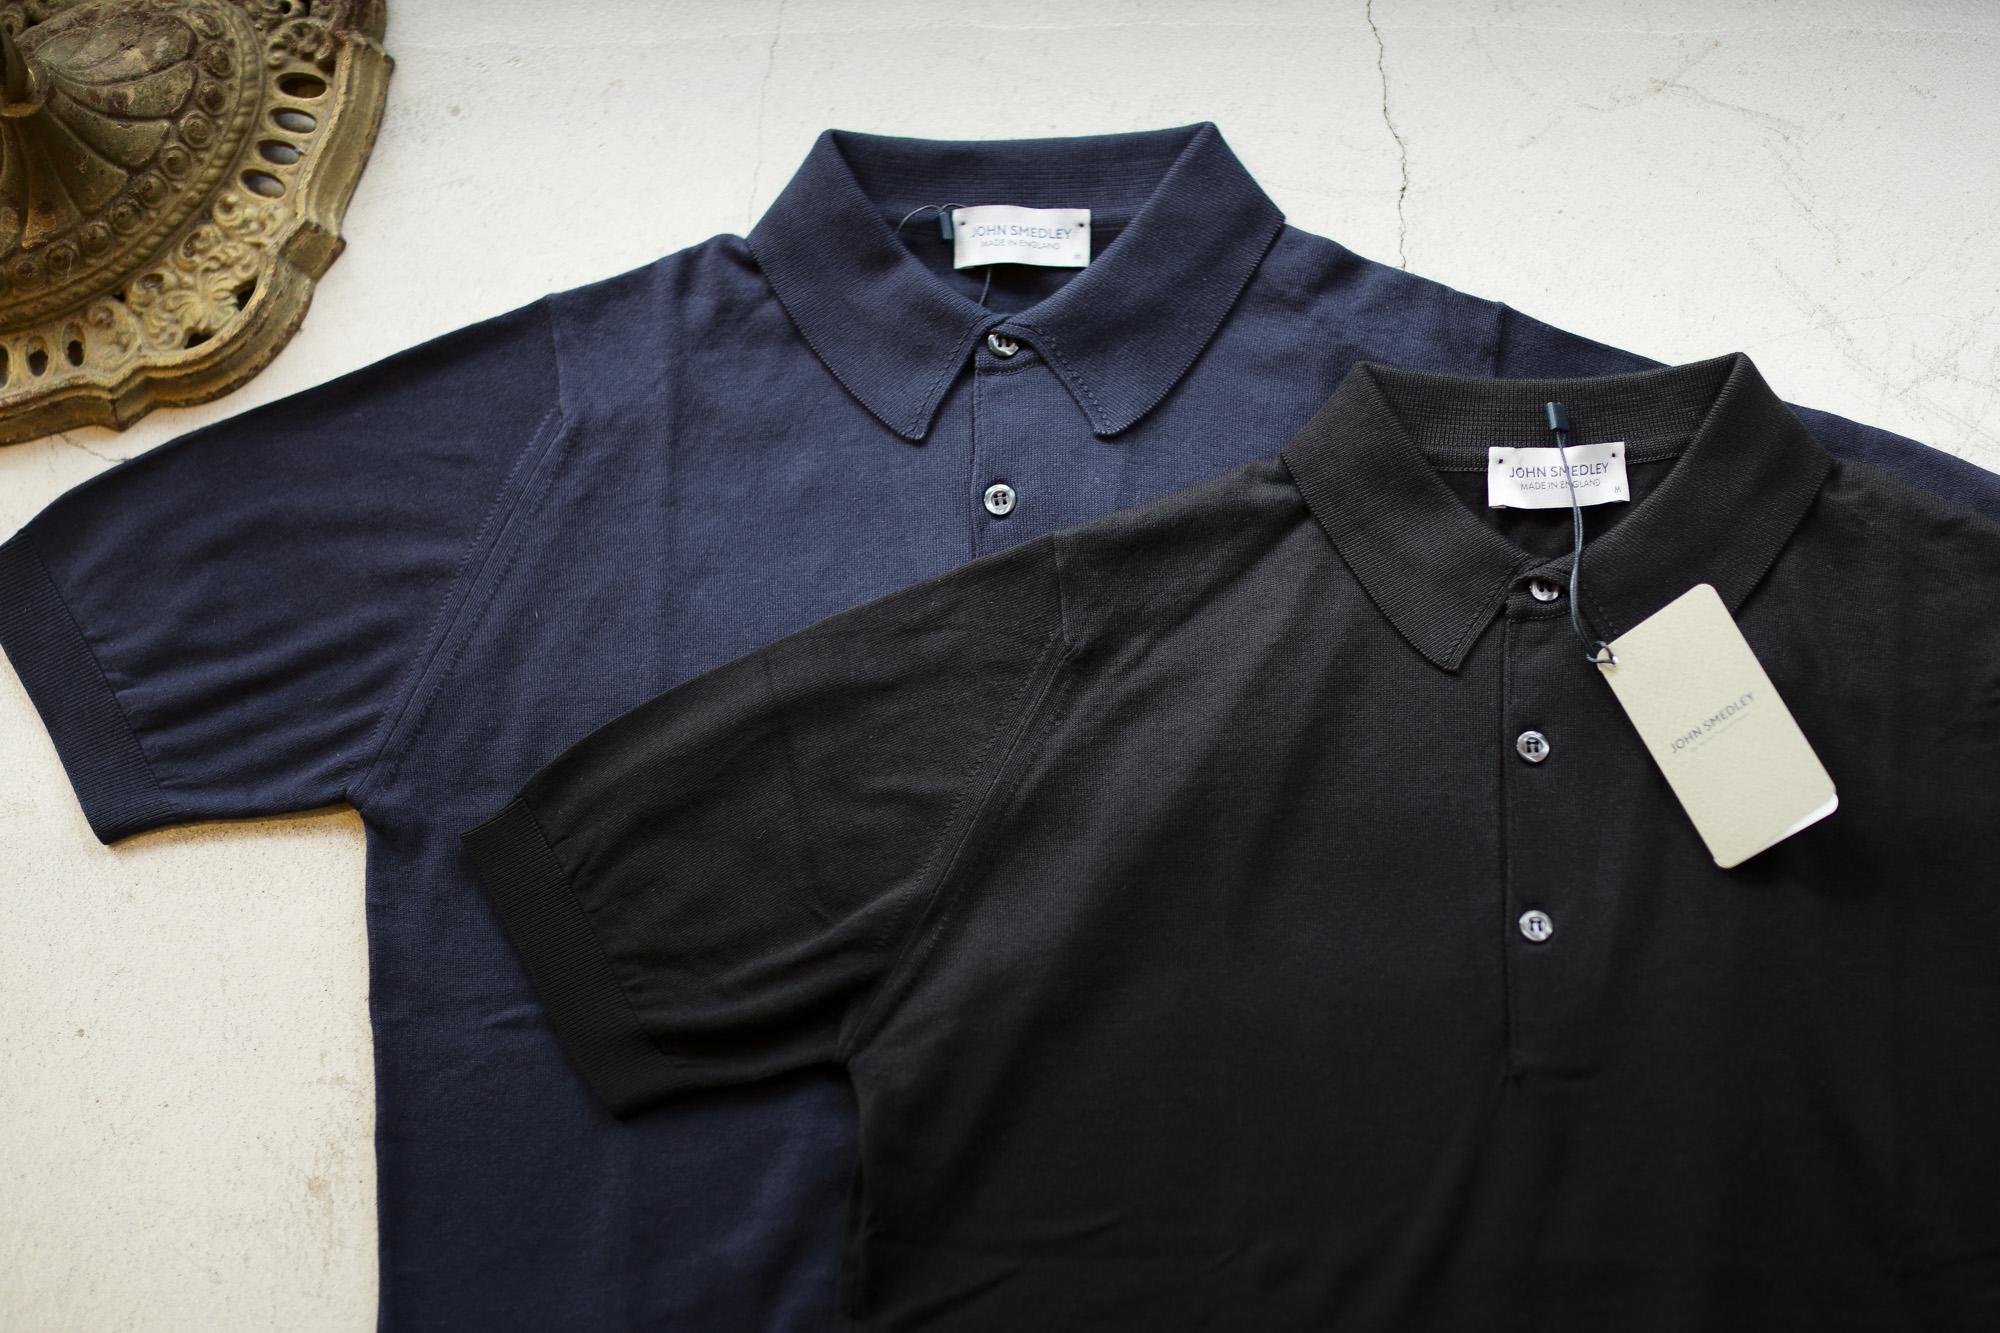 JOHN SMEDLEY (ジョンスメドレー) S3798 Polo Shirt SEA ISLAND COTTON (シーアイランドコットン) ポロシャツ NAVY (ネイビー) , BLACK (ブラック) Made in England (イギリス製) 2019 春夏新作 johnsmedley 愛知 名古屋 altoediritto アルトエデリット